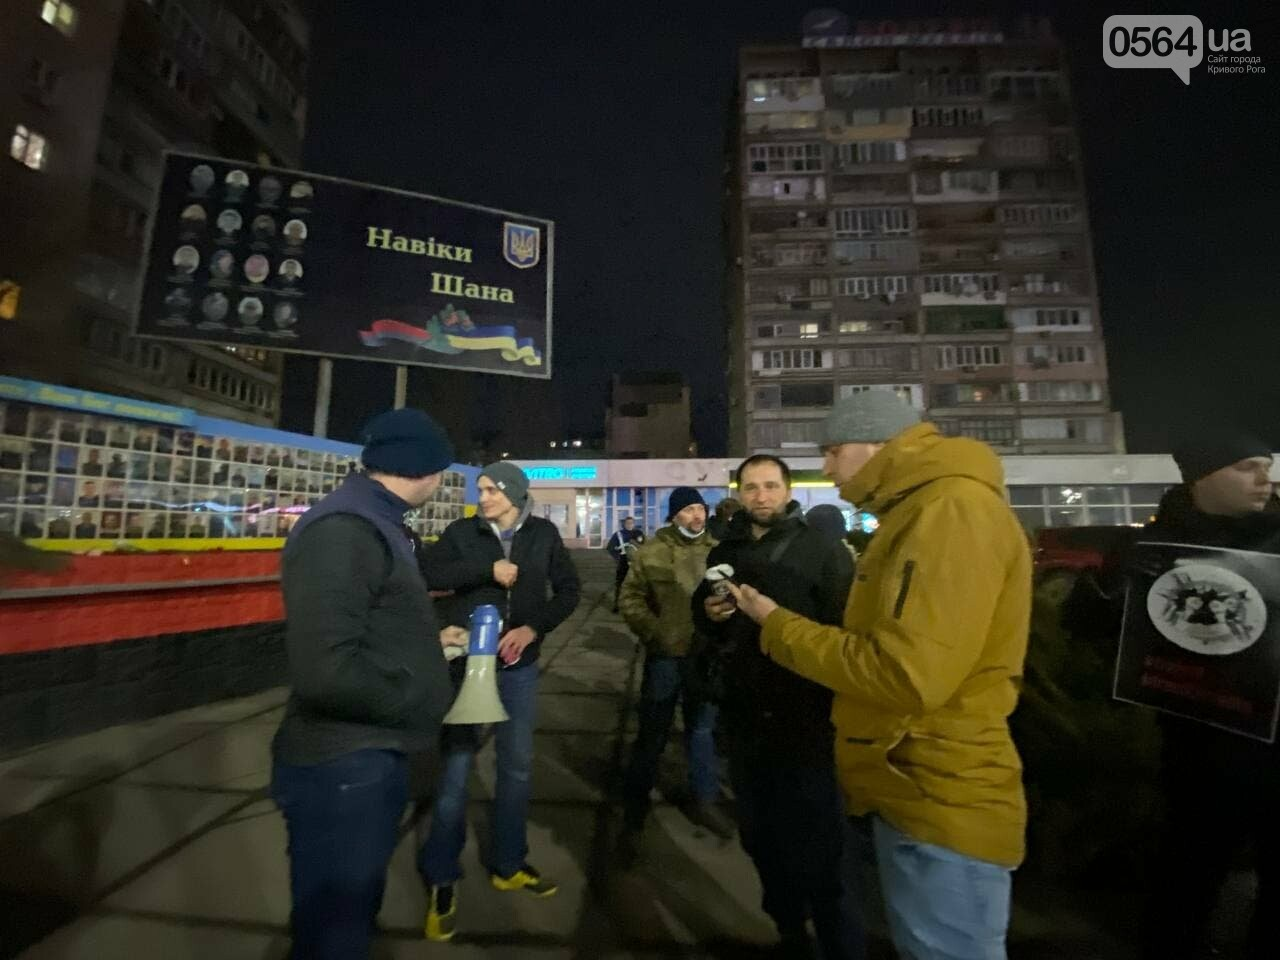 """Свободу політв'язням! #ВолюСтерненку #FreeRiffmaster"", - в Кривом Роге активисты вышли на протест, - ФОТО, ВИДЕО, фото-3"